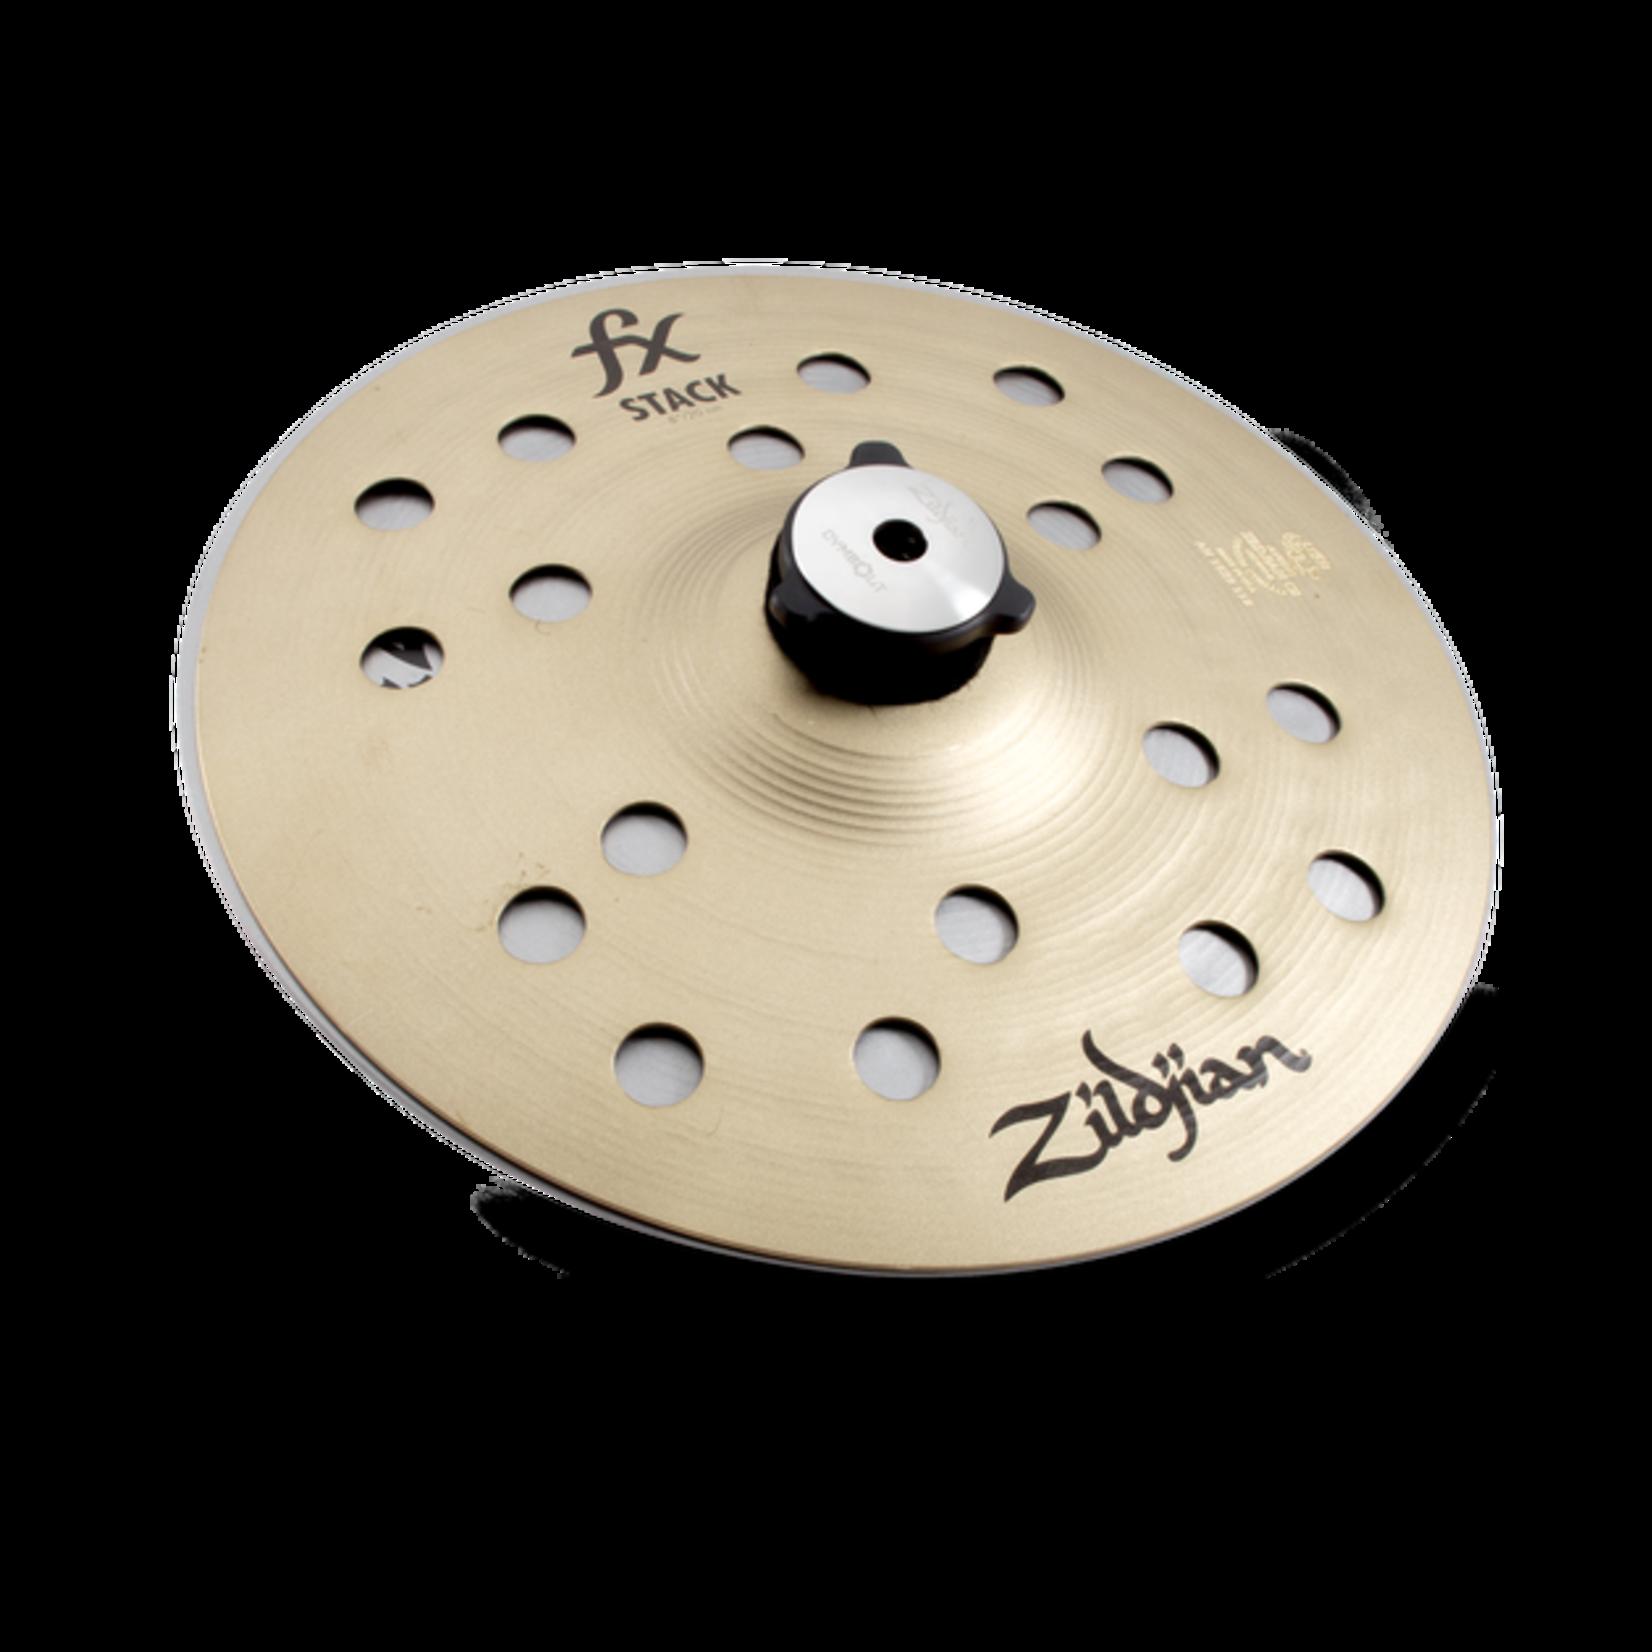 "Zildjian Zildjian 8"" FX Stack Pair w/Mount"